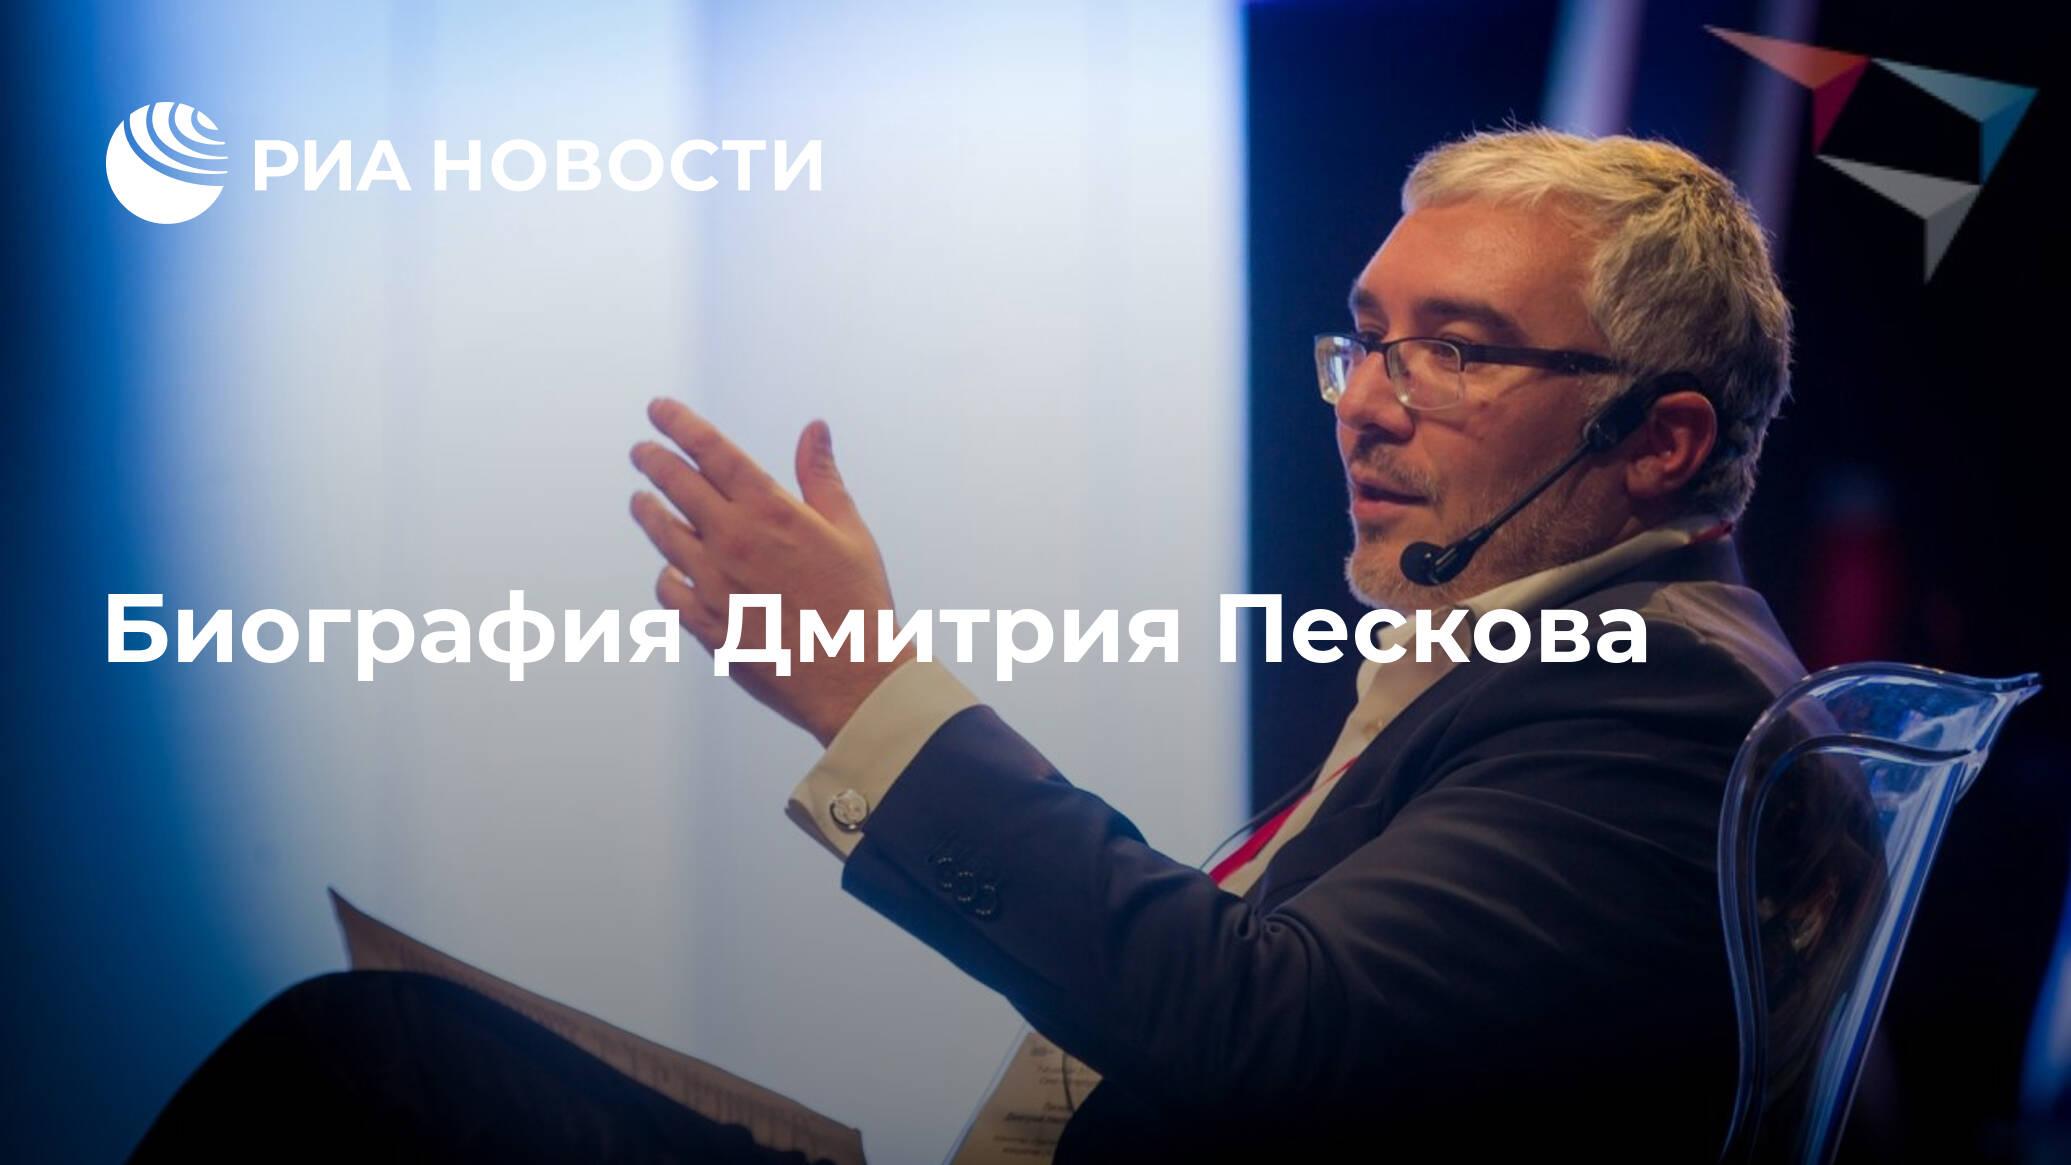 Биография Дмитрия Пескова